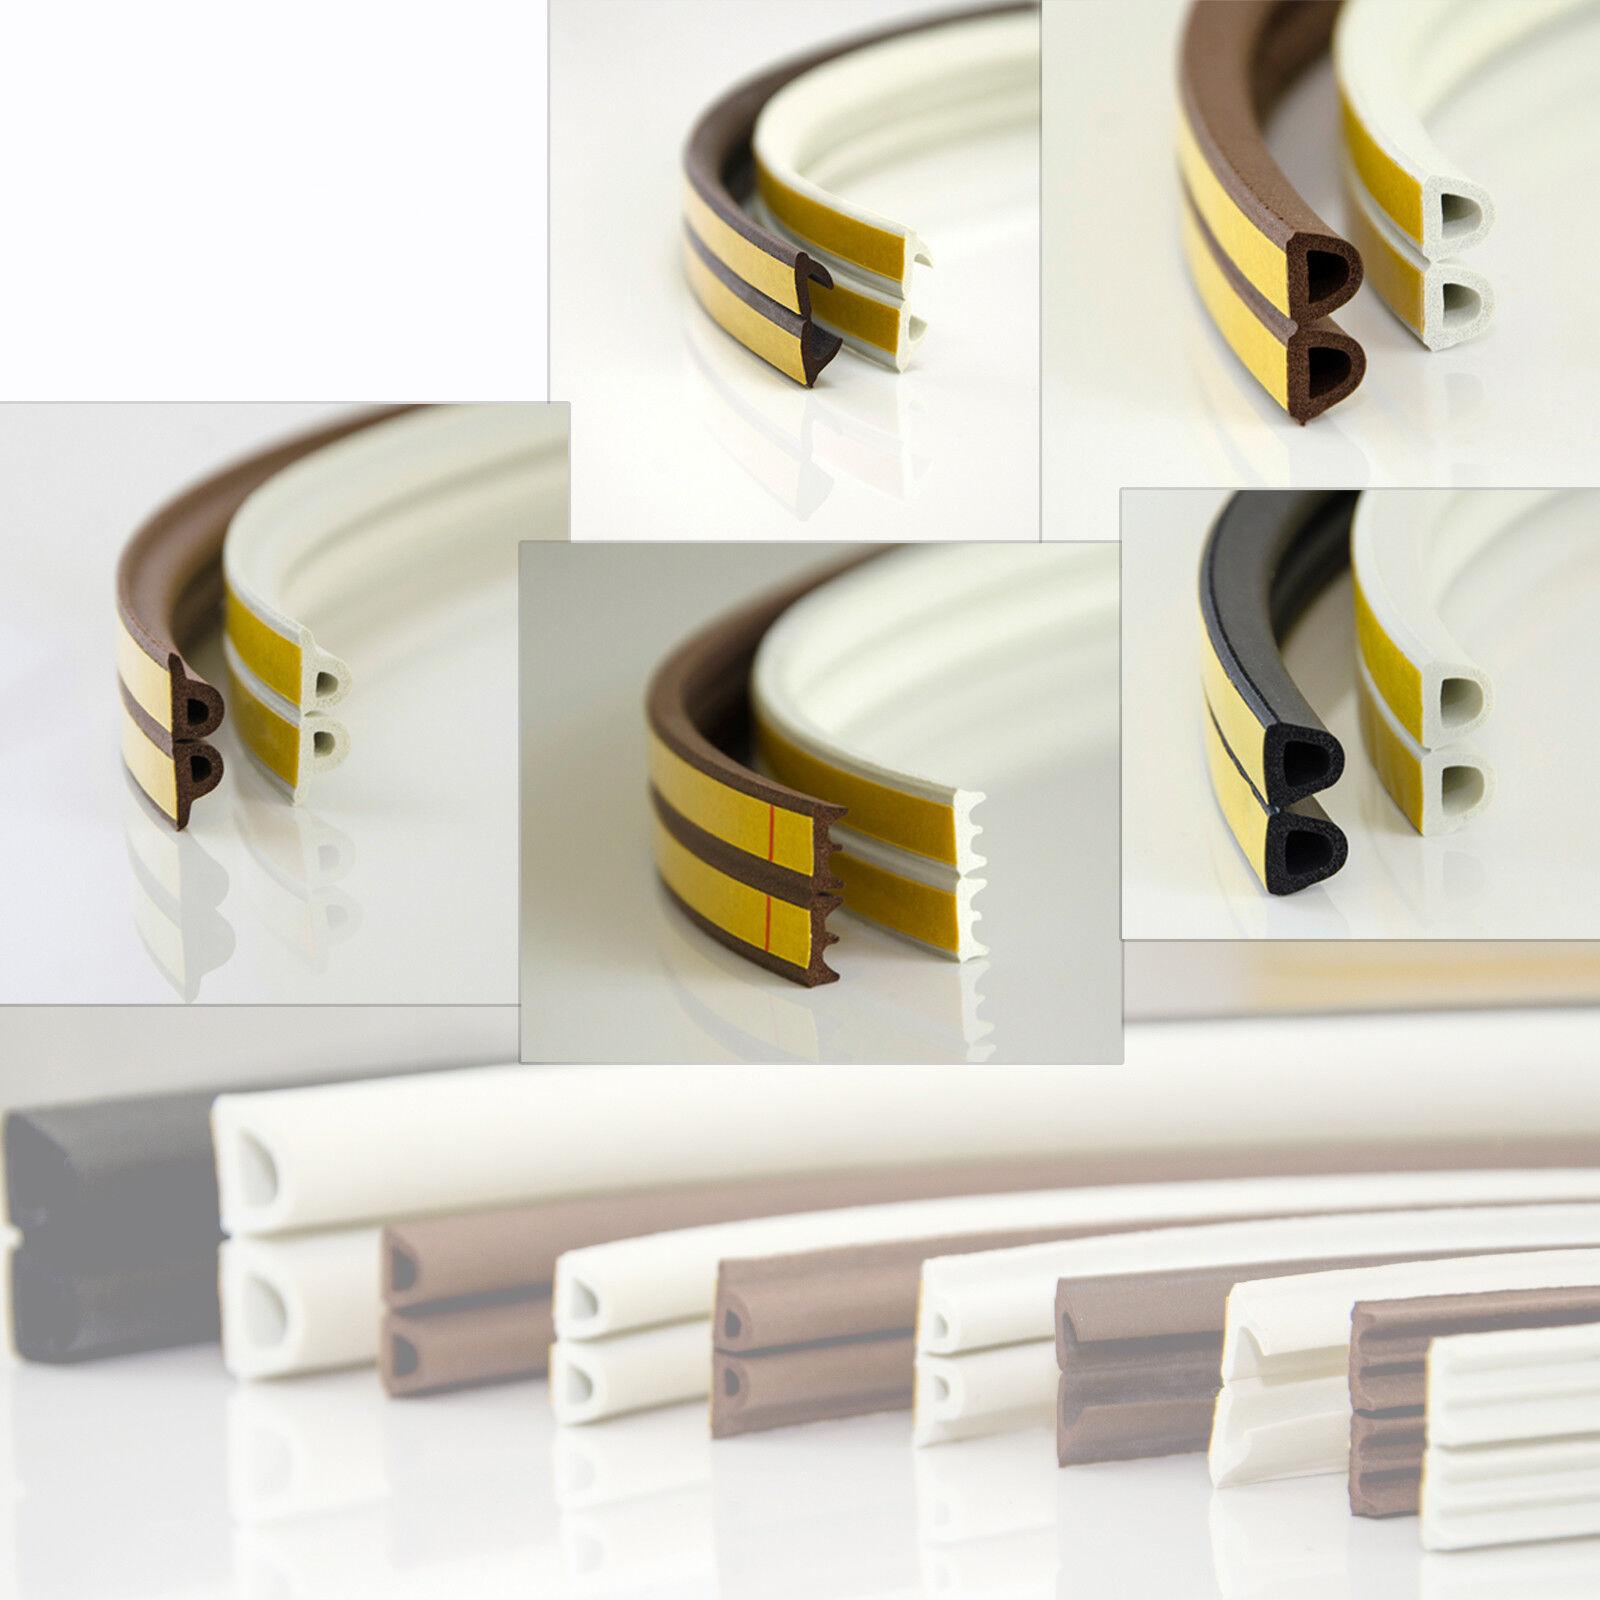 1m - 100m Gummidichtung Fensterdichtung selbstklebend Profil EPVD Gummi Dichtung